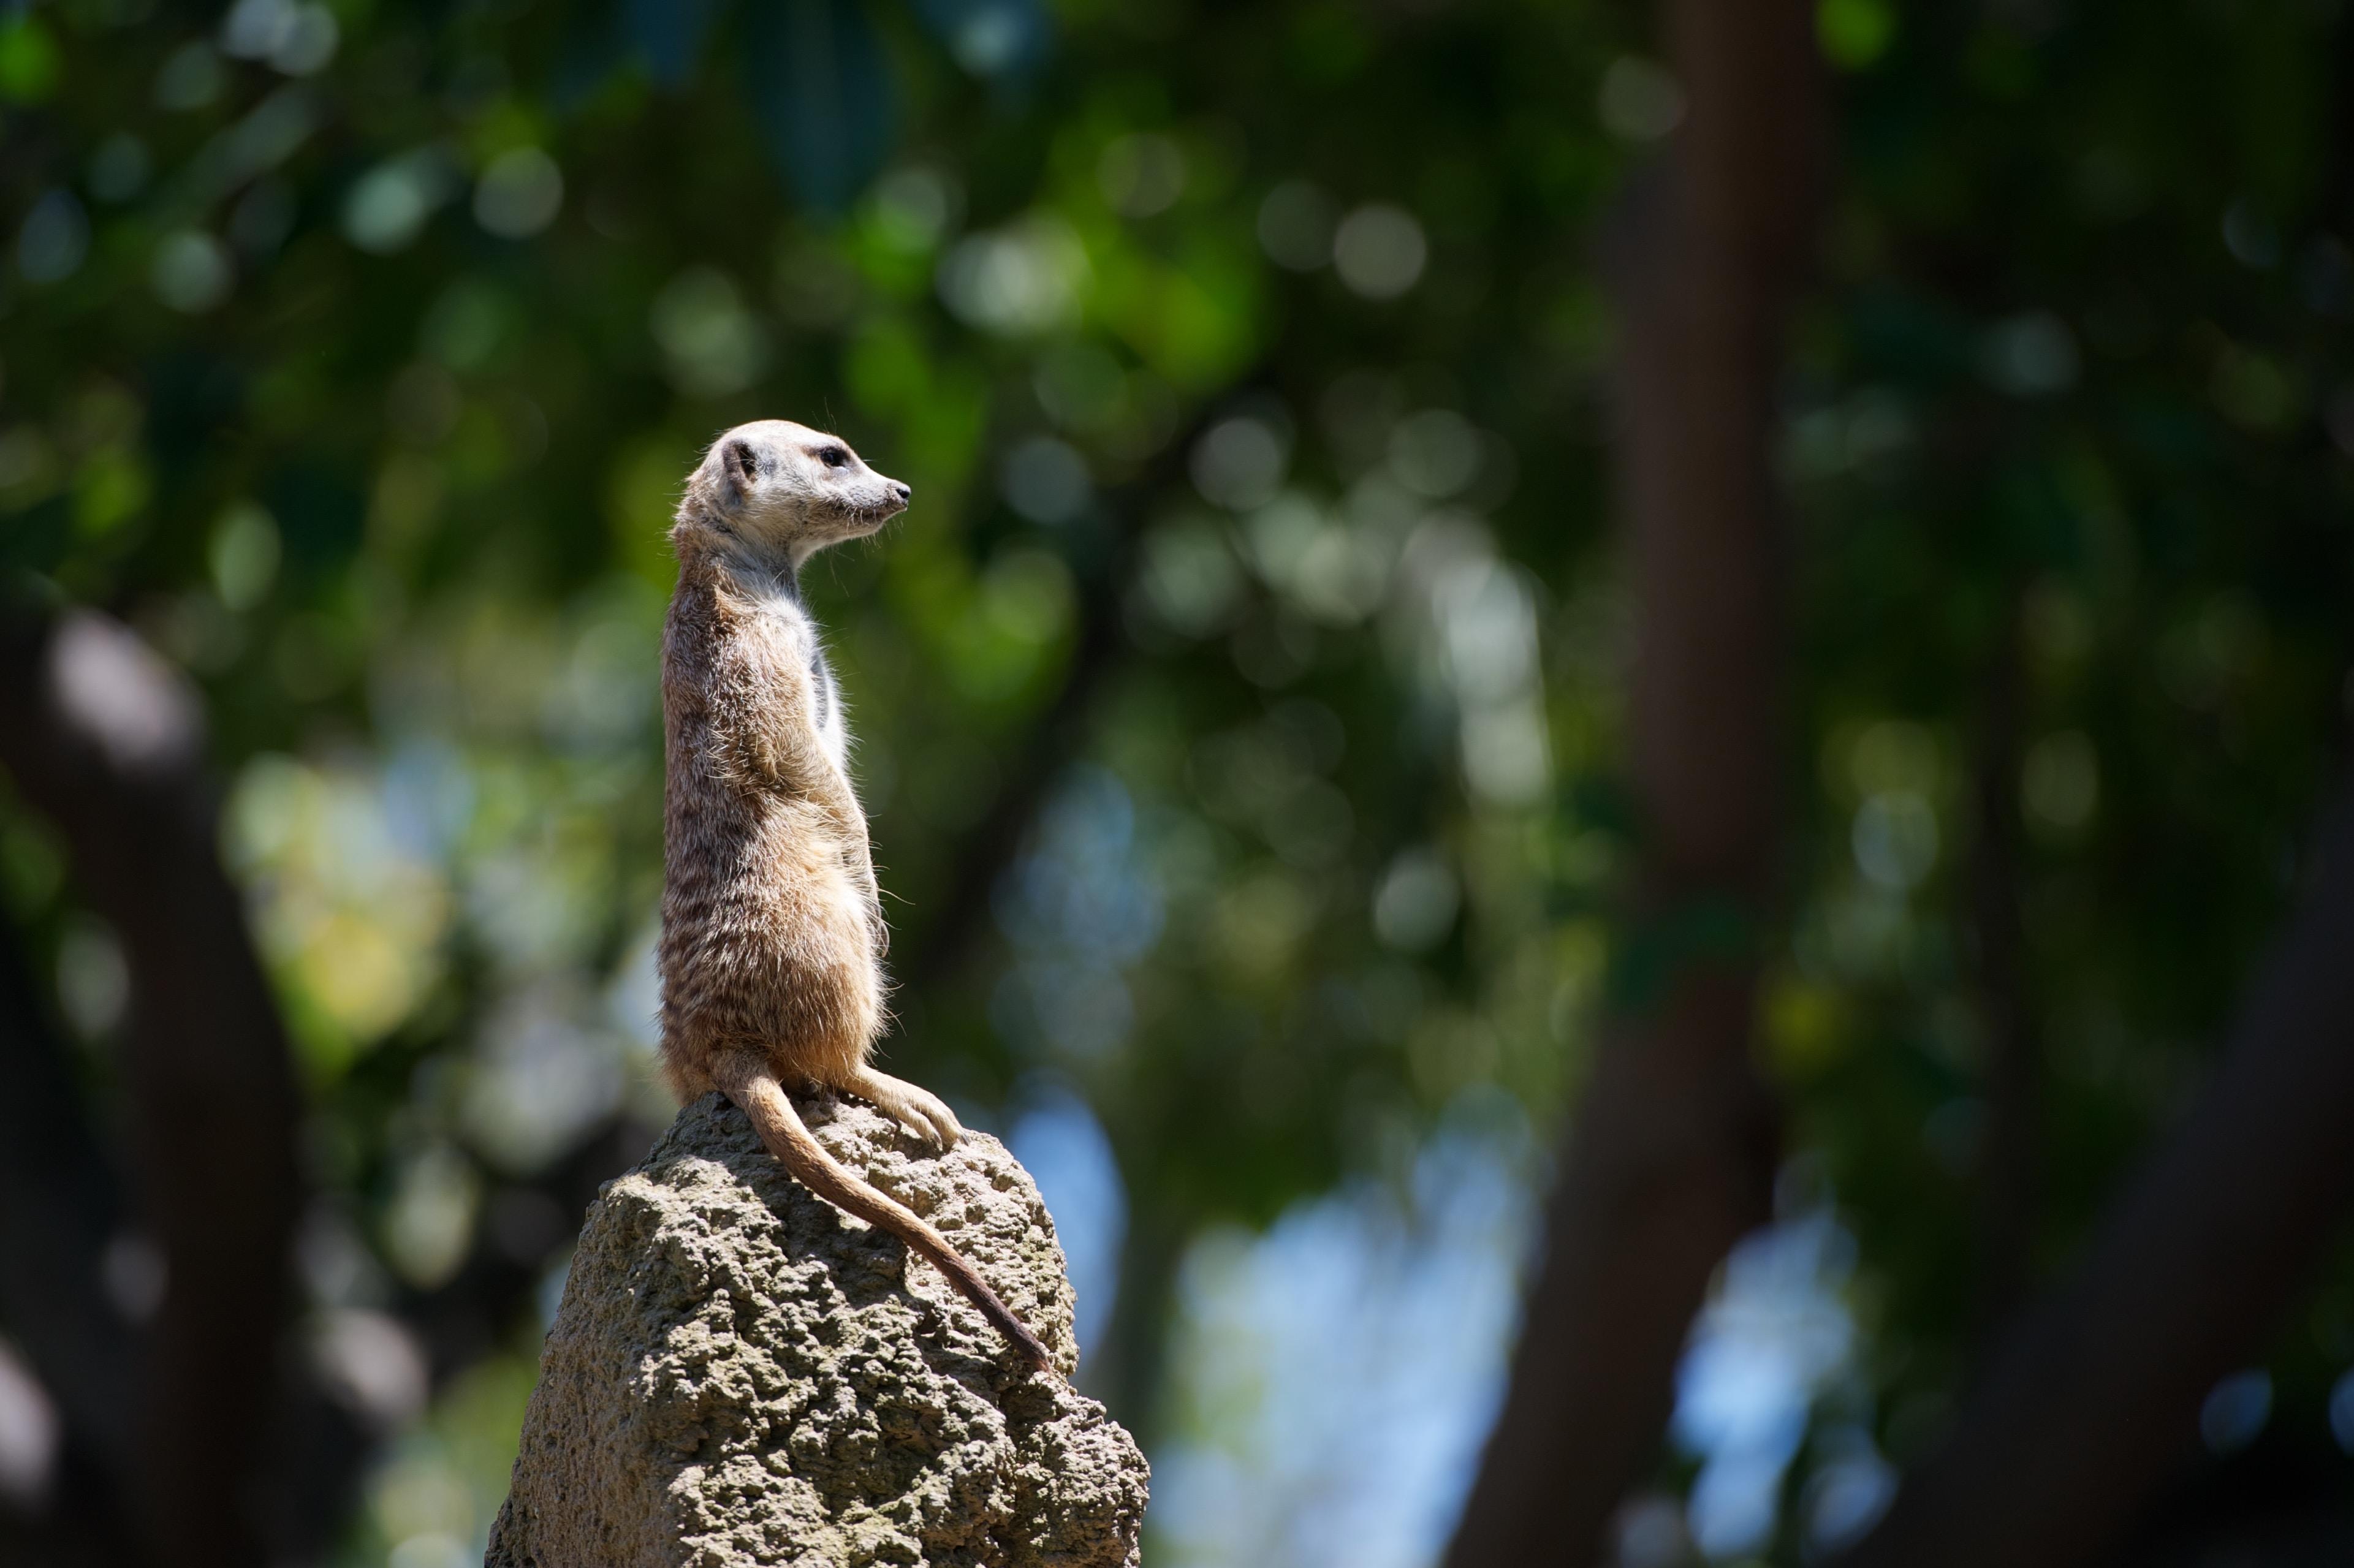 meerkat standing on gray stone selective focus photography